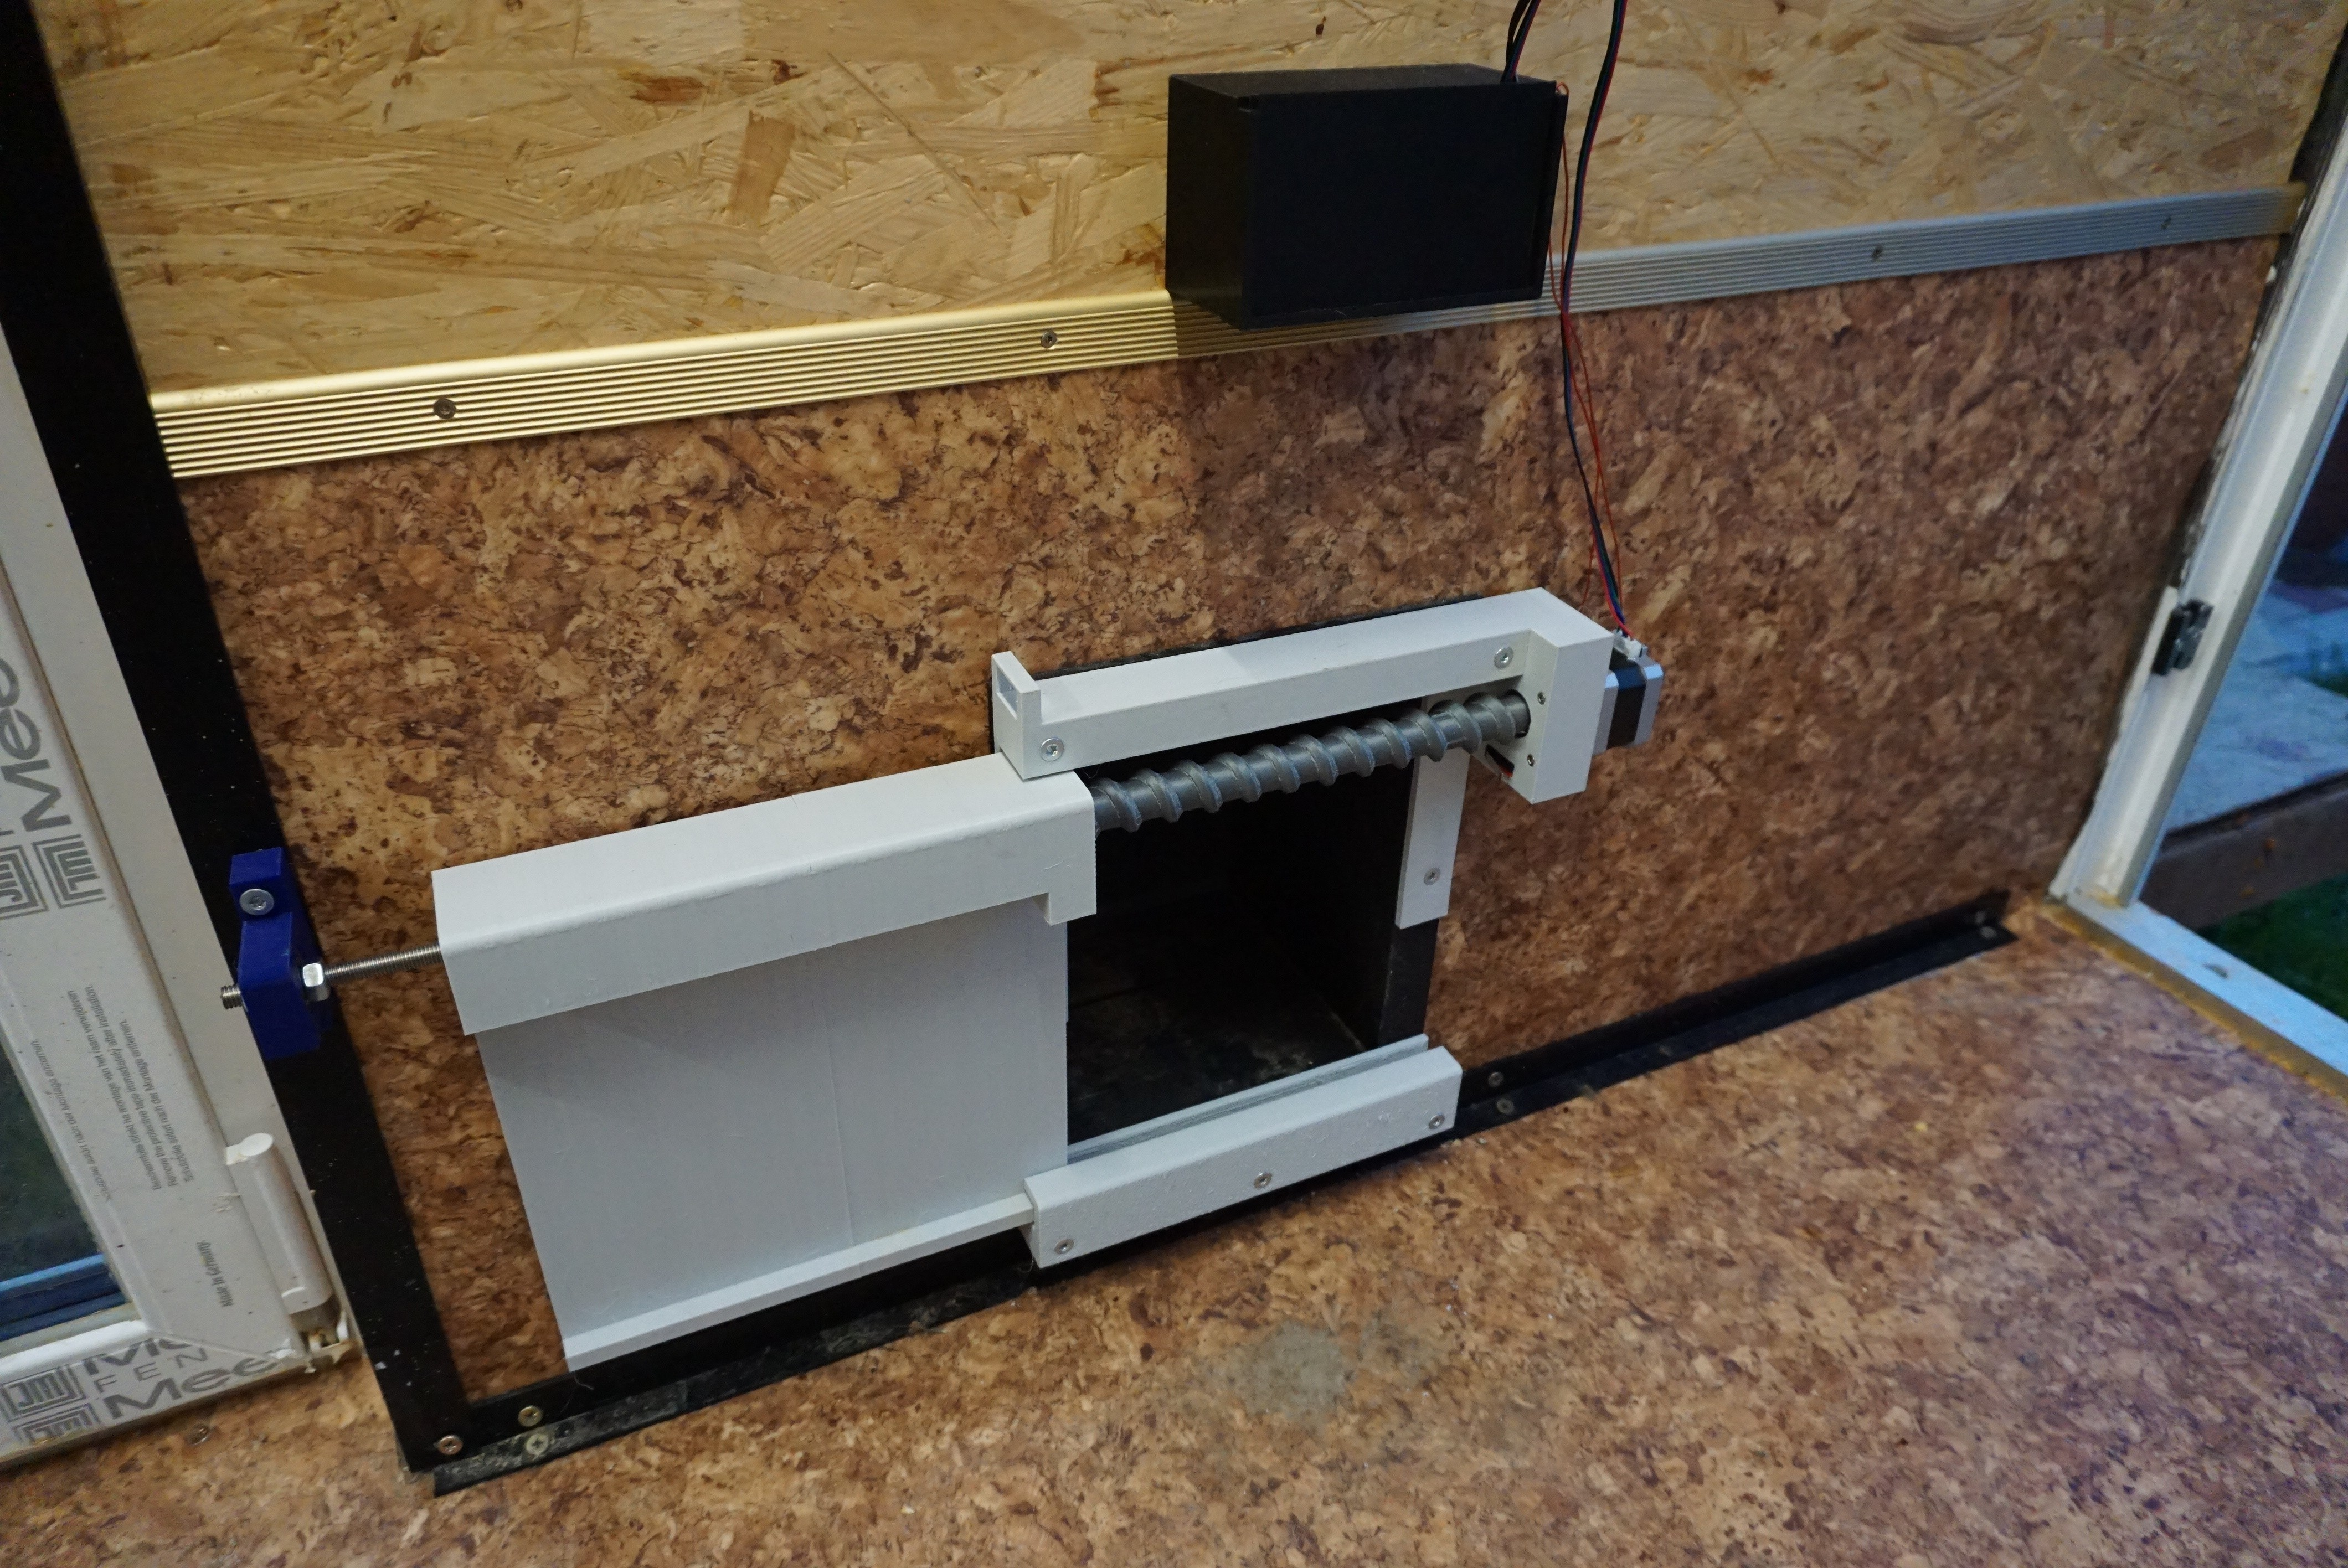 DSC06080.JPG Download free STL file Cat Flap Automatic Door • 3D printing model, Edd77